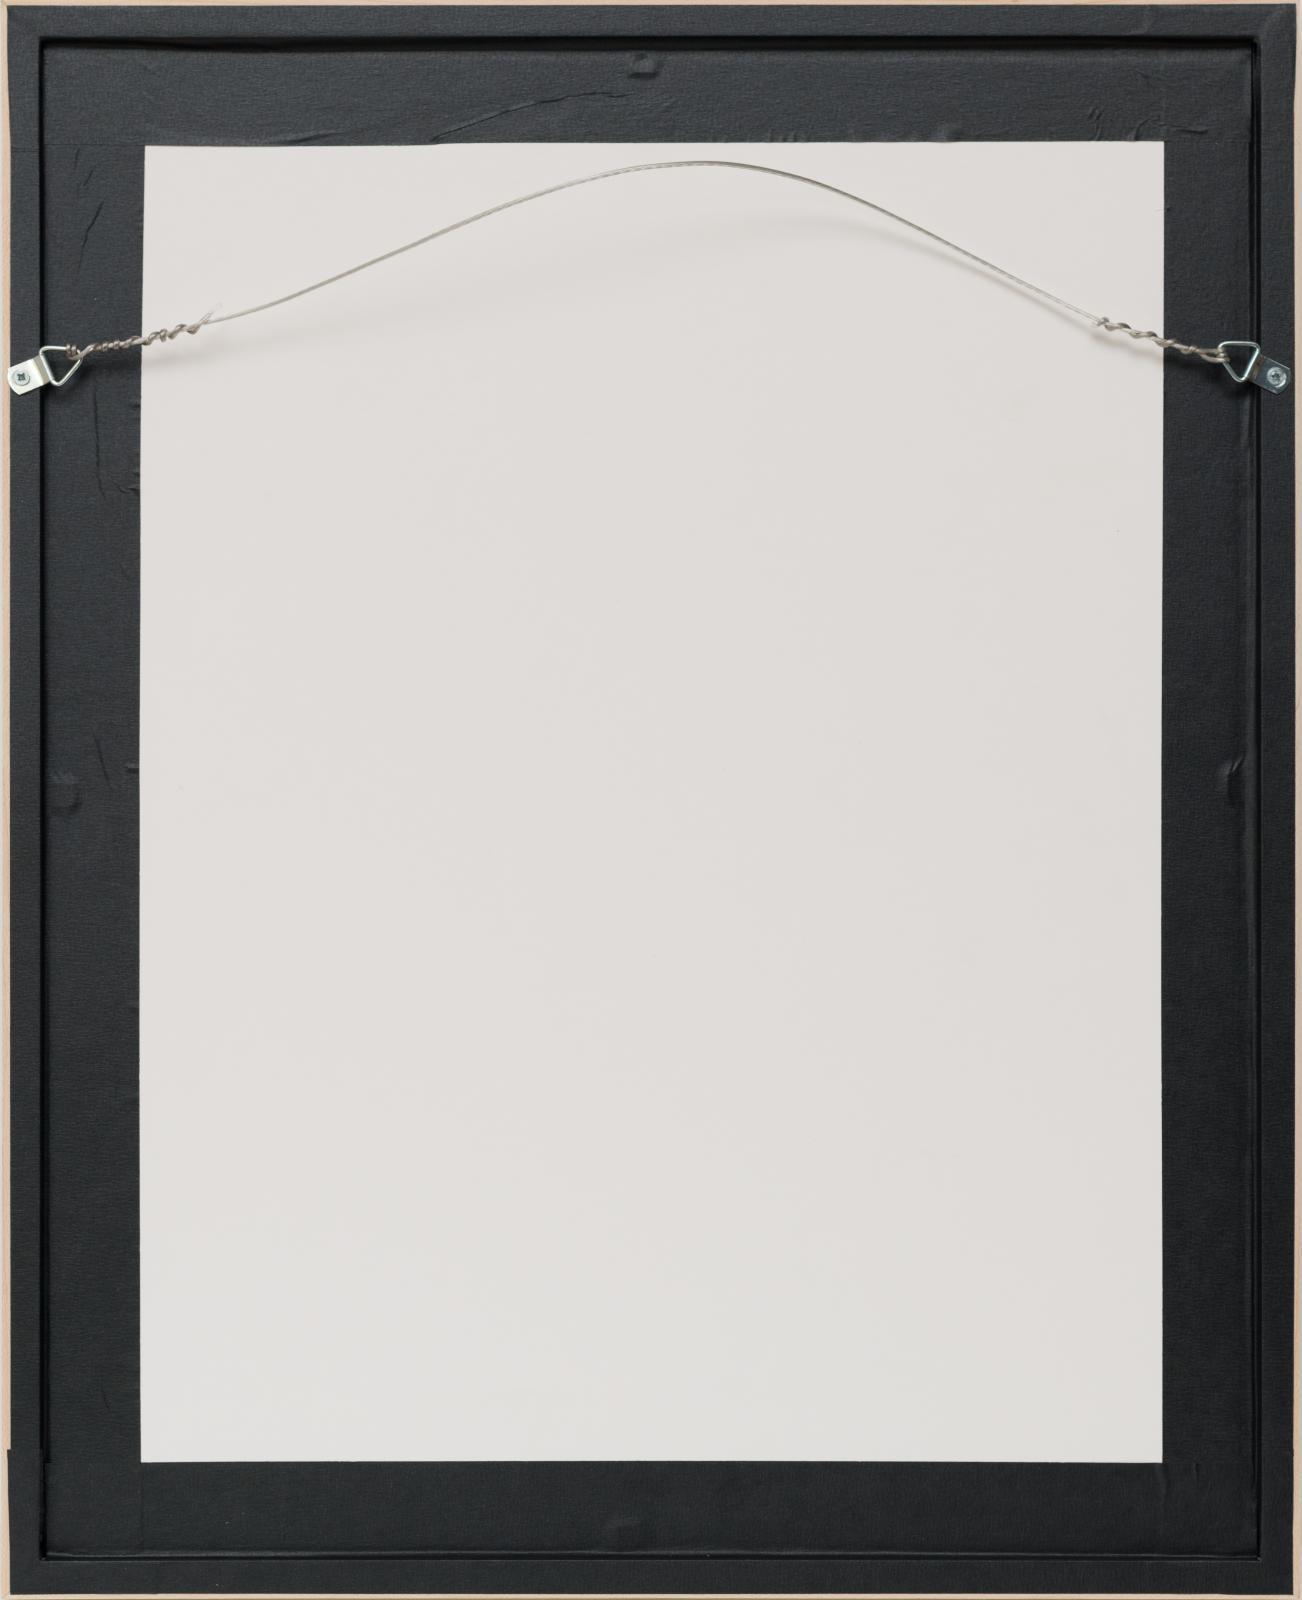 Fuchsia-Upright Type